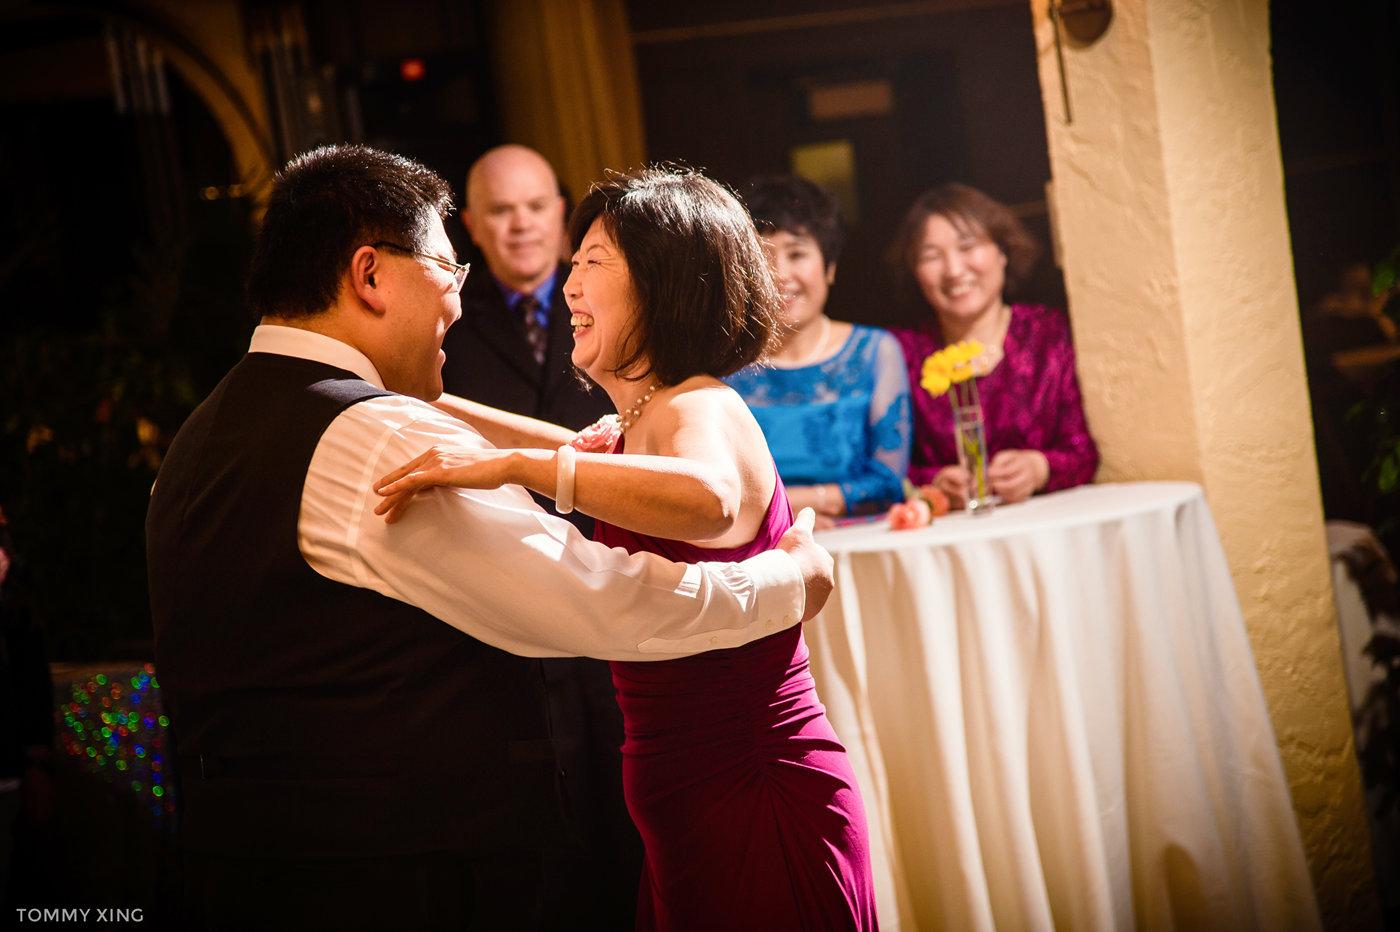 STANFORD MEMORIAL CHURCH WEDDING - Wenjie & Chengcheng - SAN FRANCISCO BAY AREA 斯坦福教堂婚礼跟拍 - 洛杉矶婚礼婚纱照摄影师 Tommy Xing Photography265.jpg